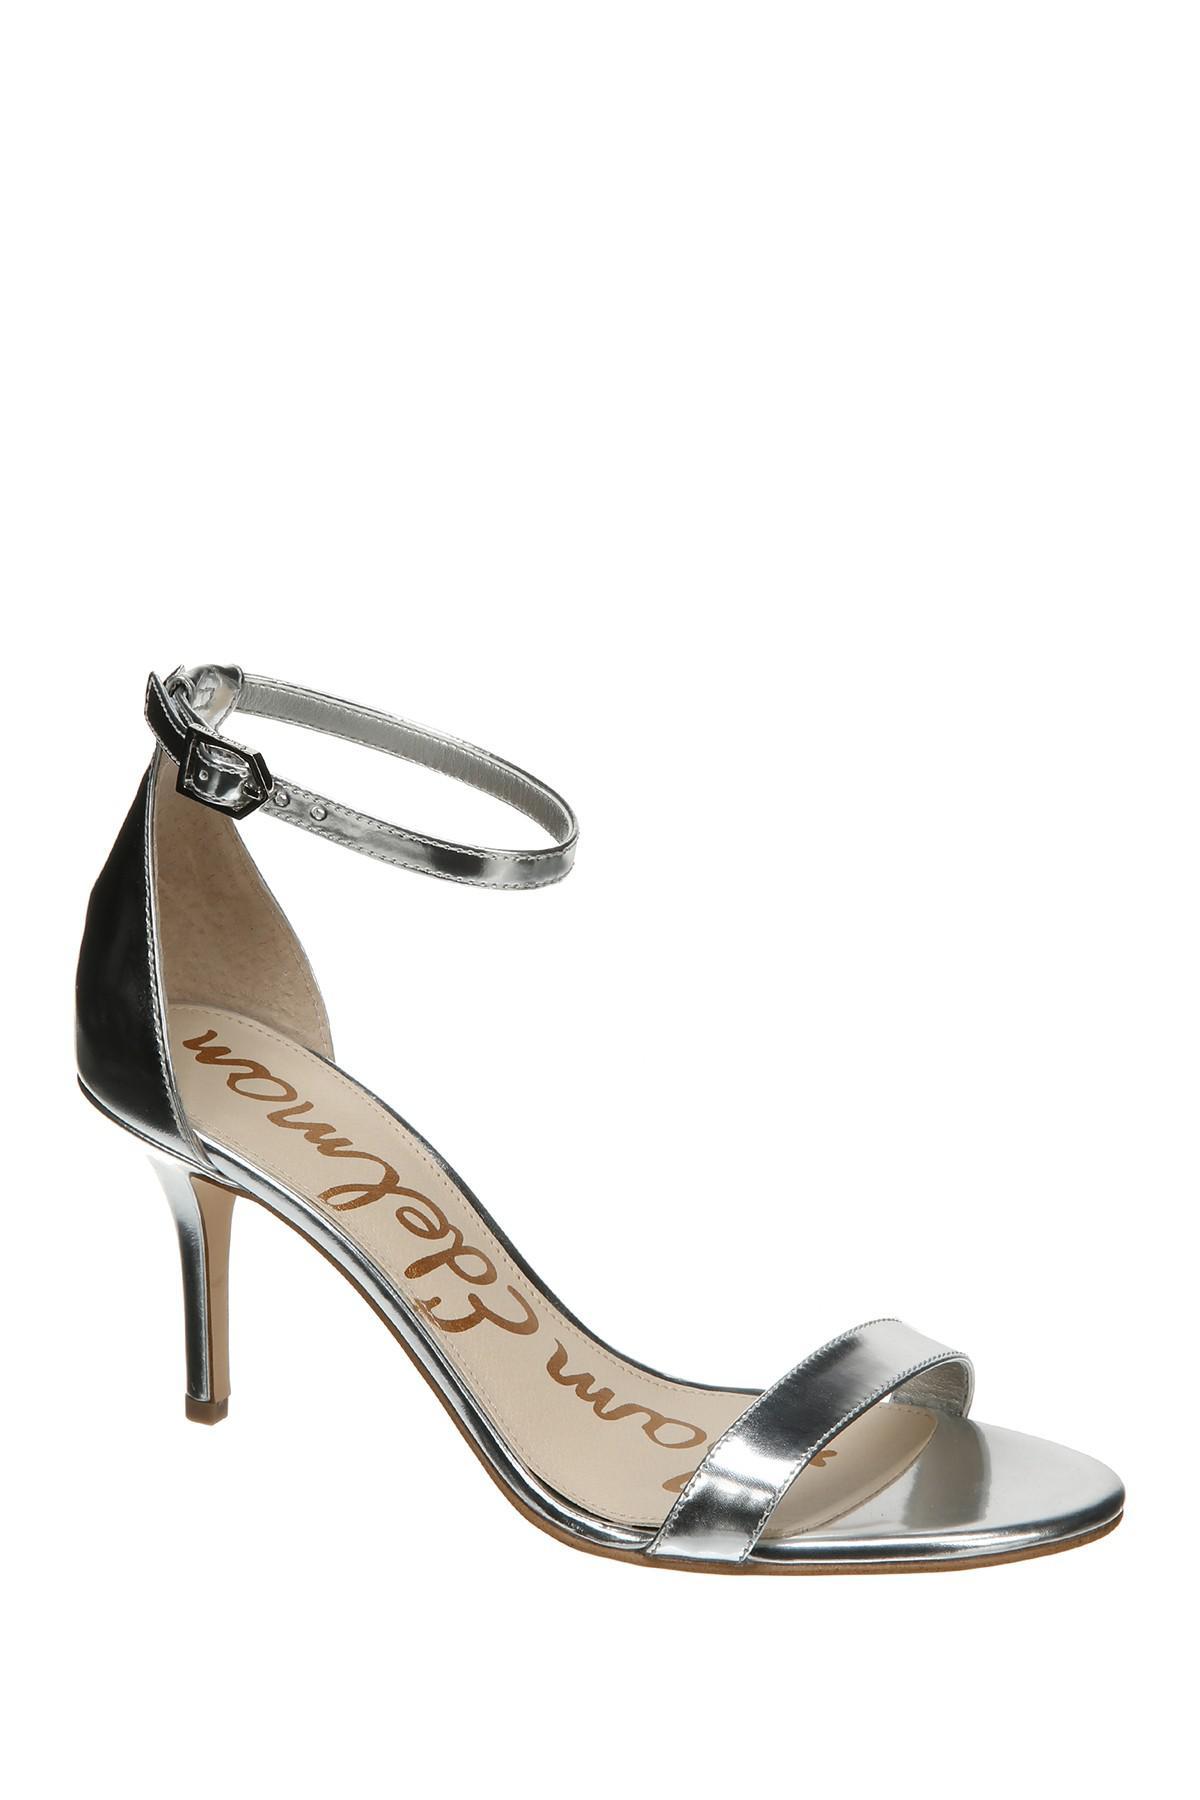 73cc36127 Lyst - Sam Edelman Patti Ankle Strap Sandal in Metallic